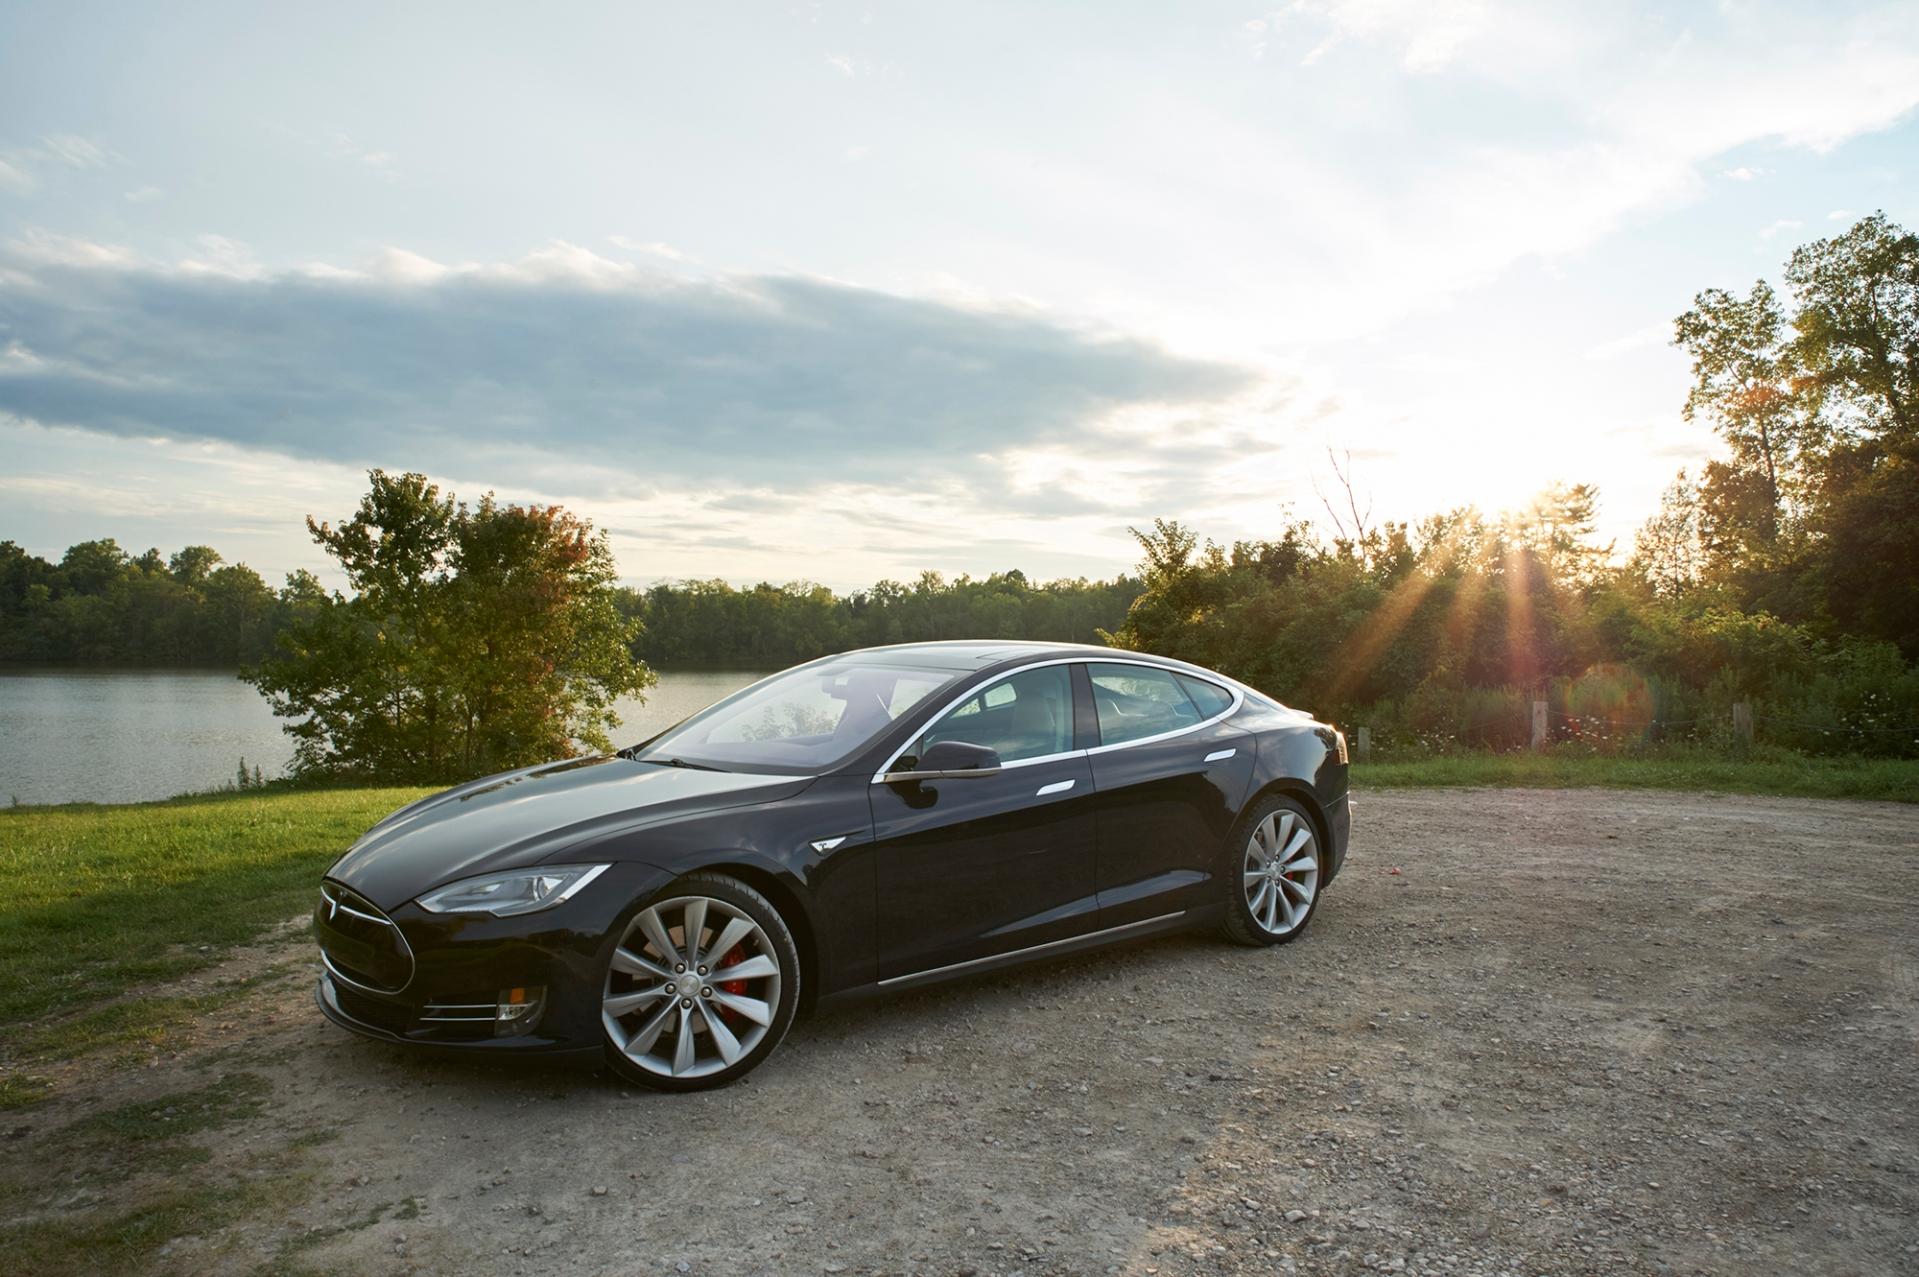 Tamron-24-70-G2-Review-Tesla-Model-S